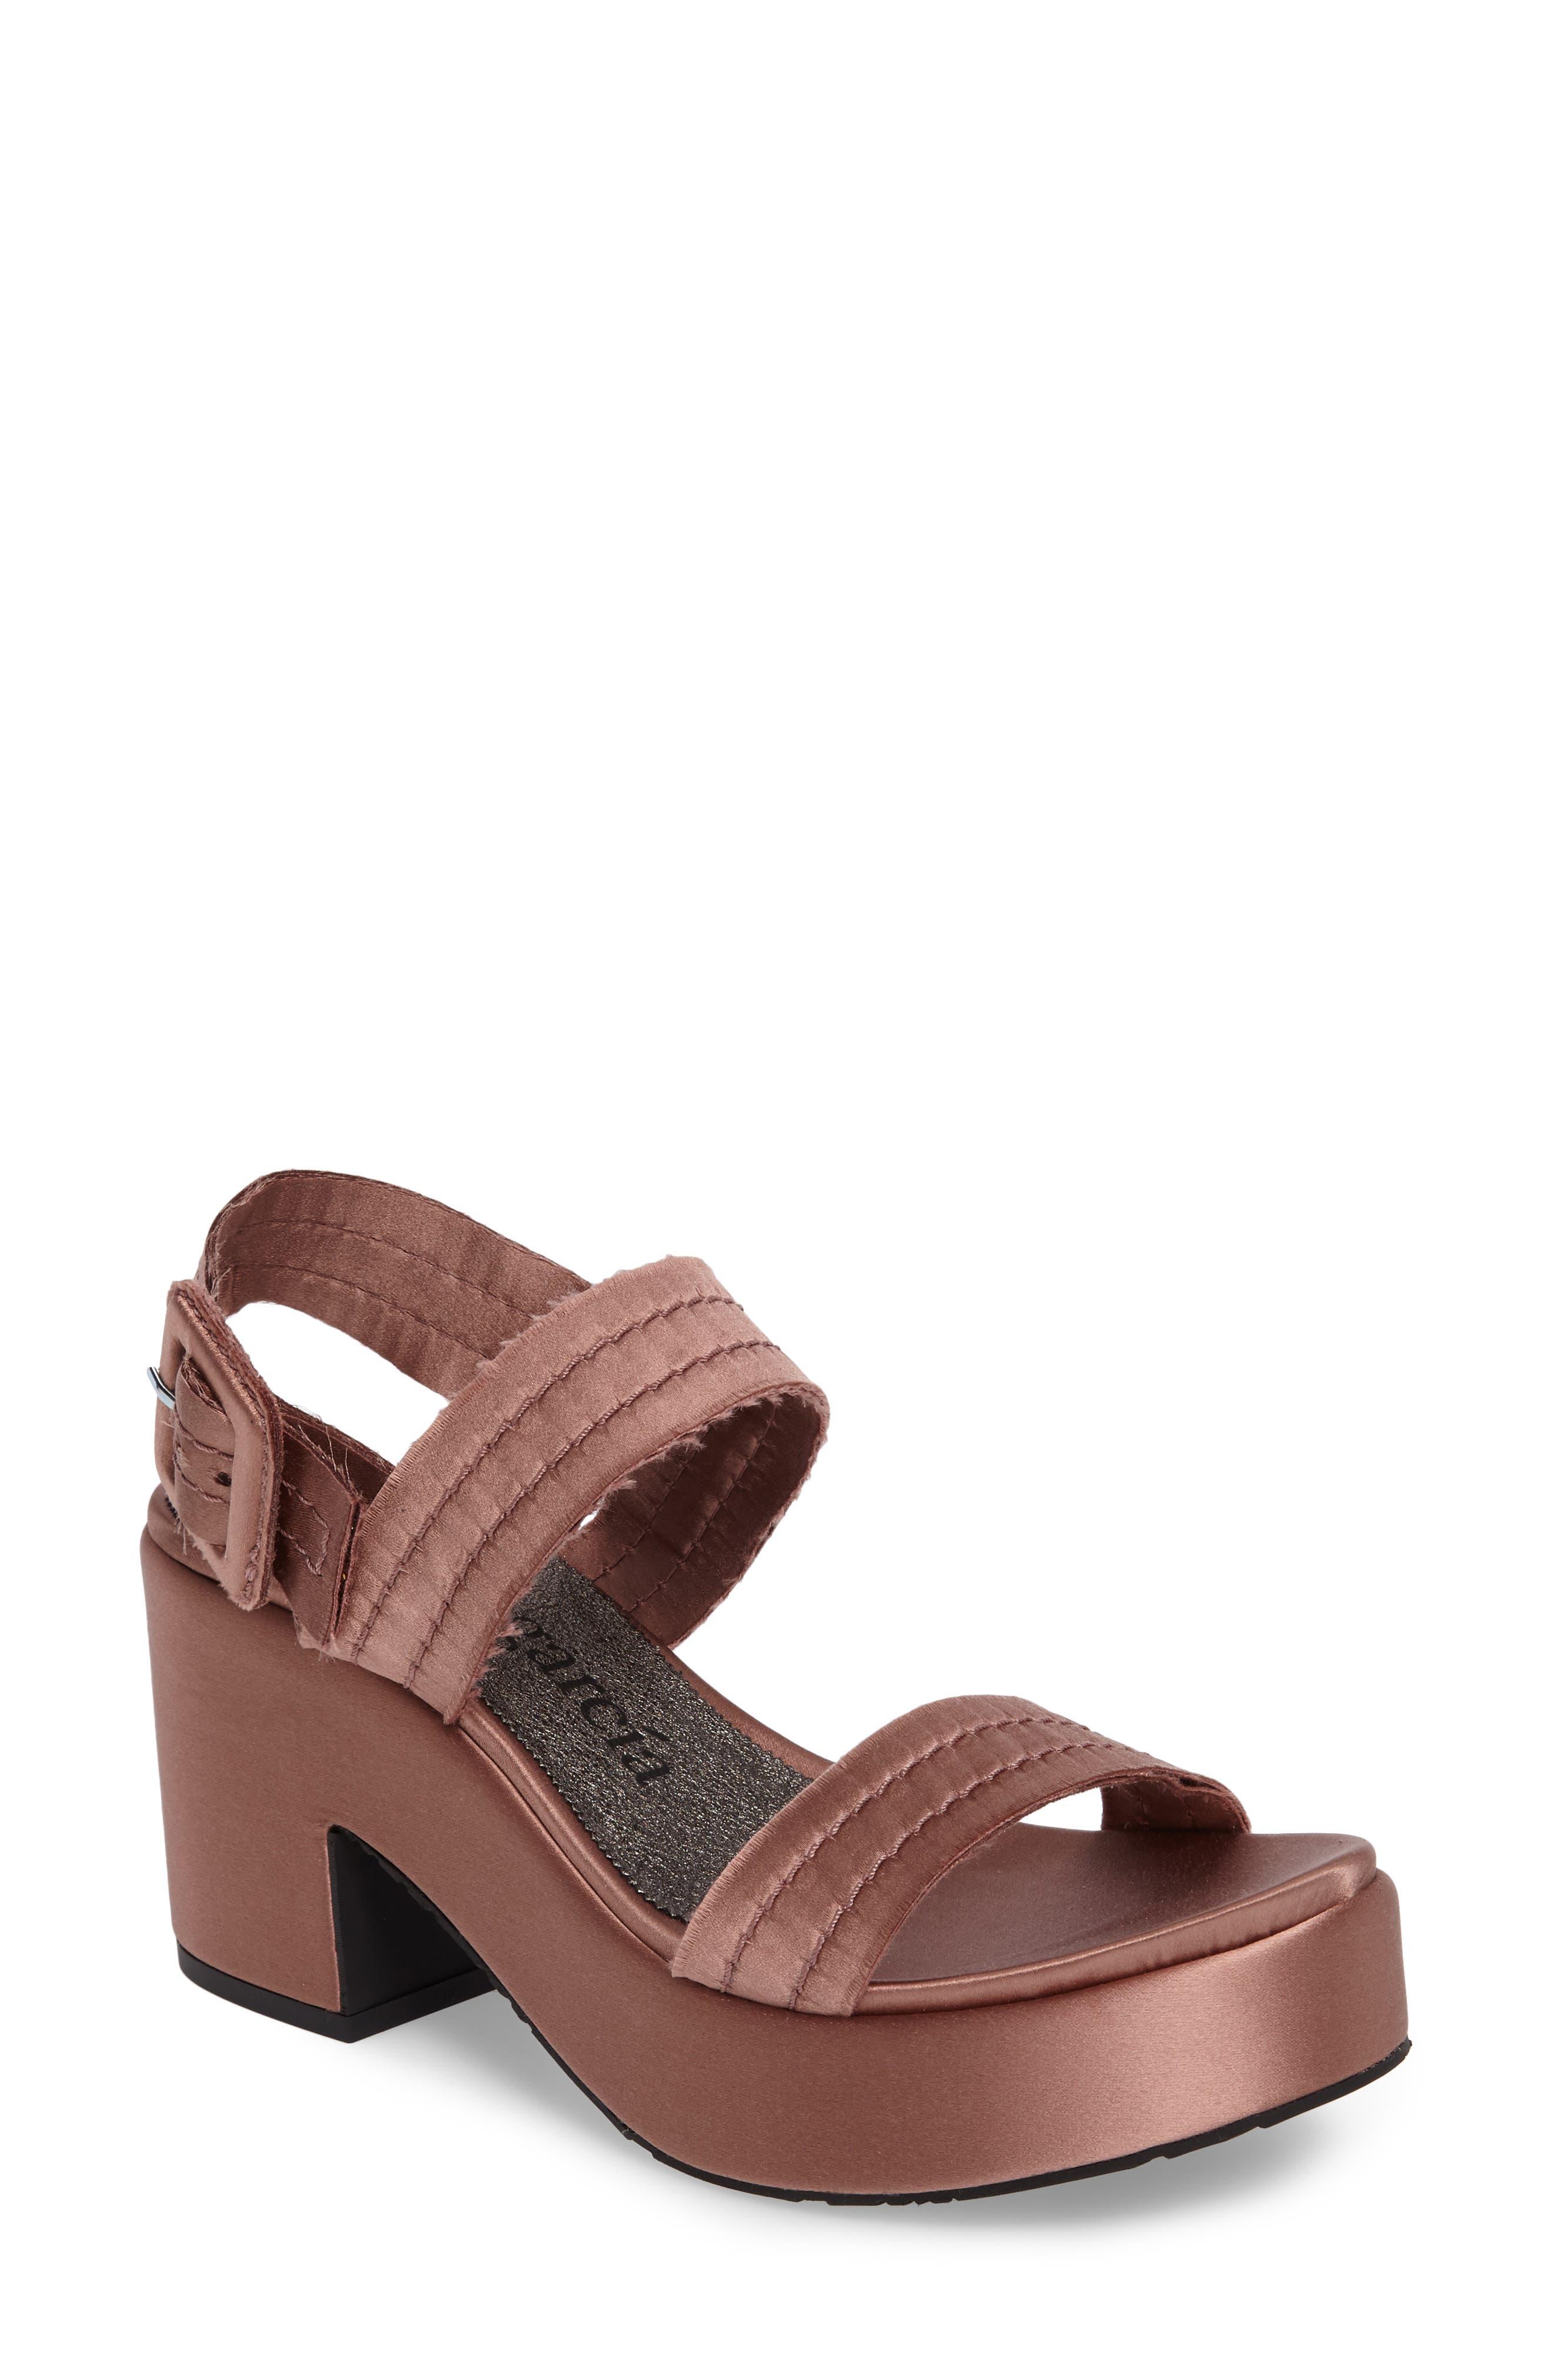 Decima Platform Sandal,                         Main,                         color, Powder Satin